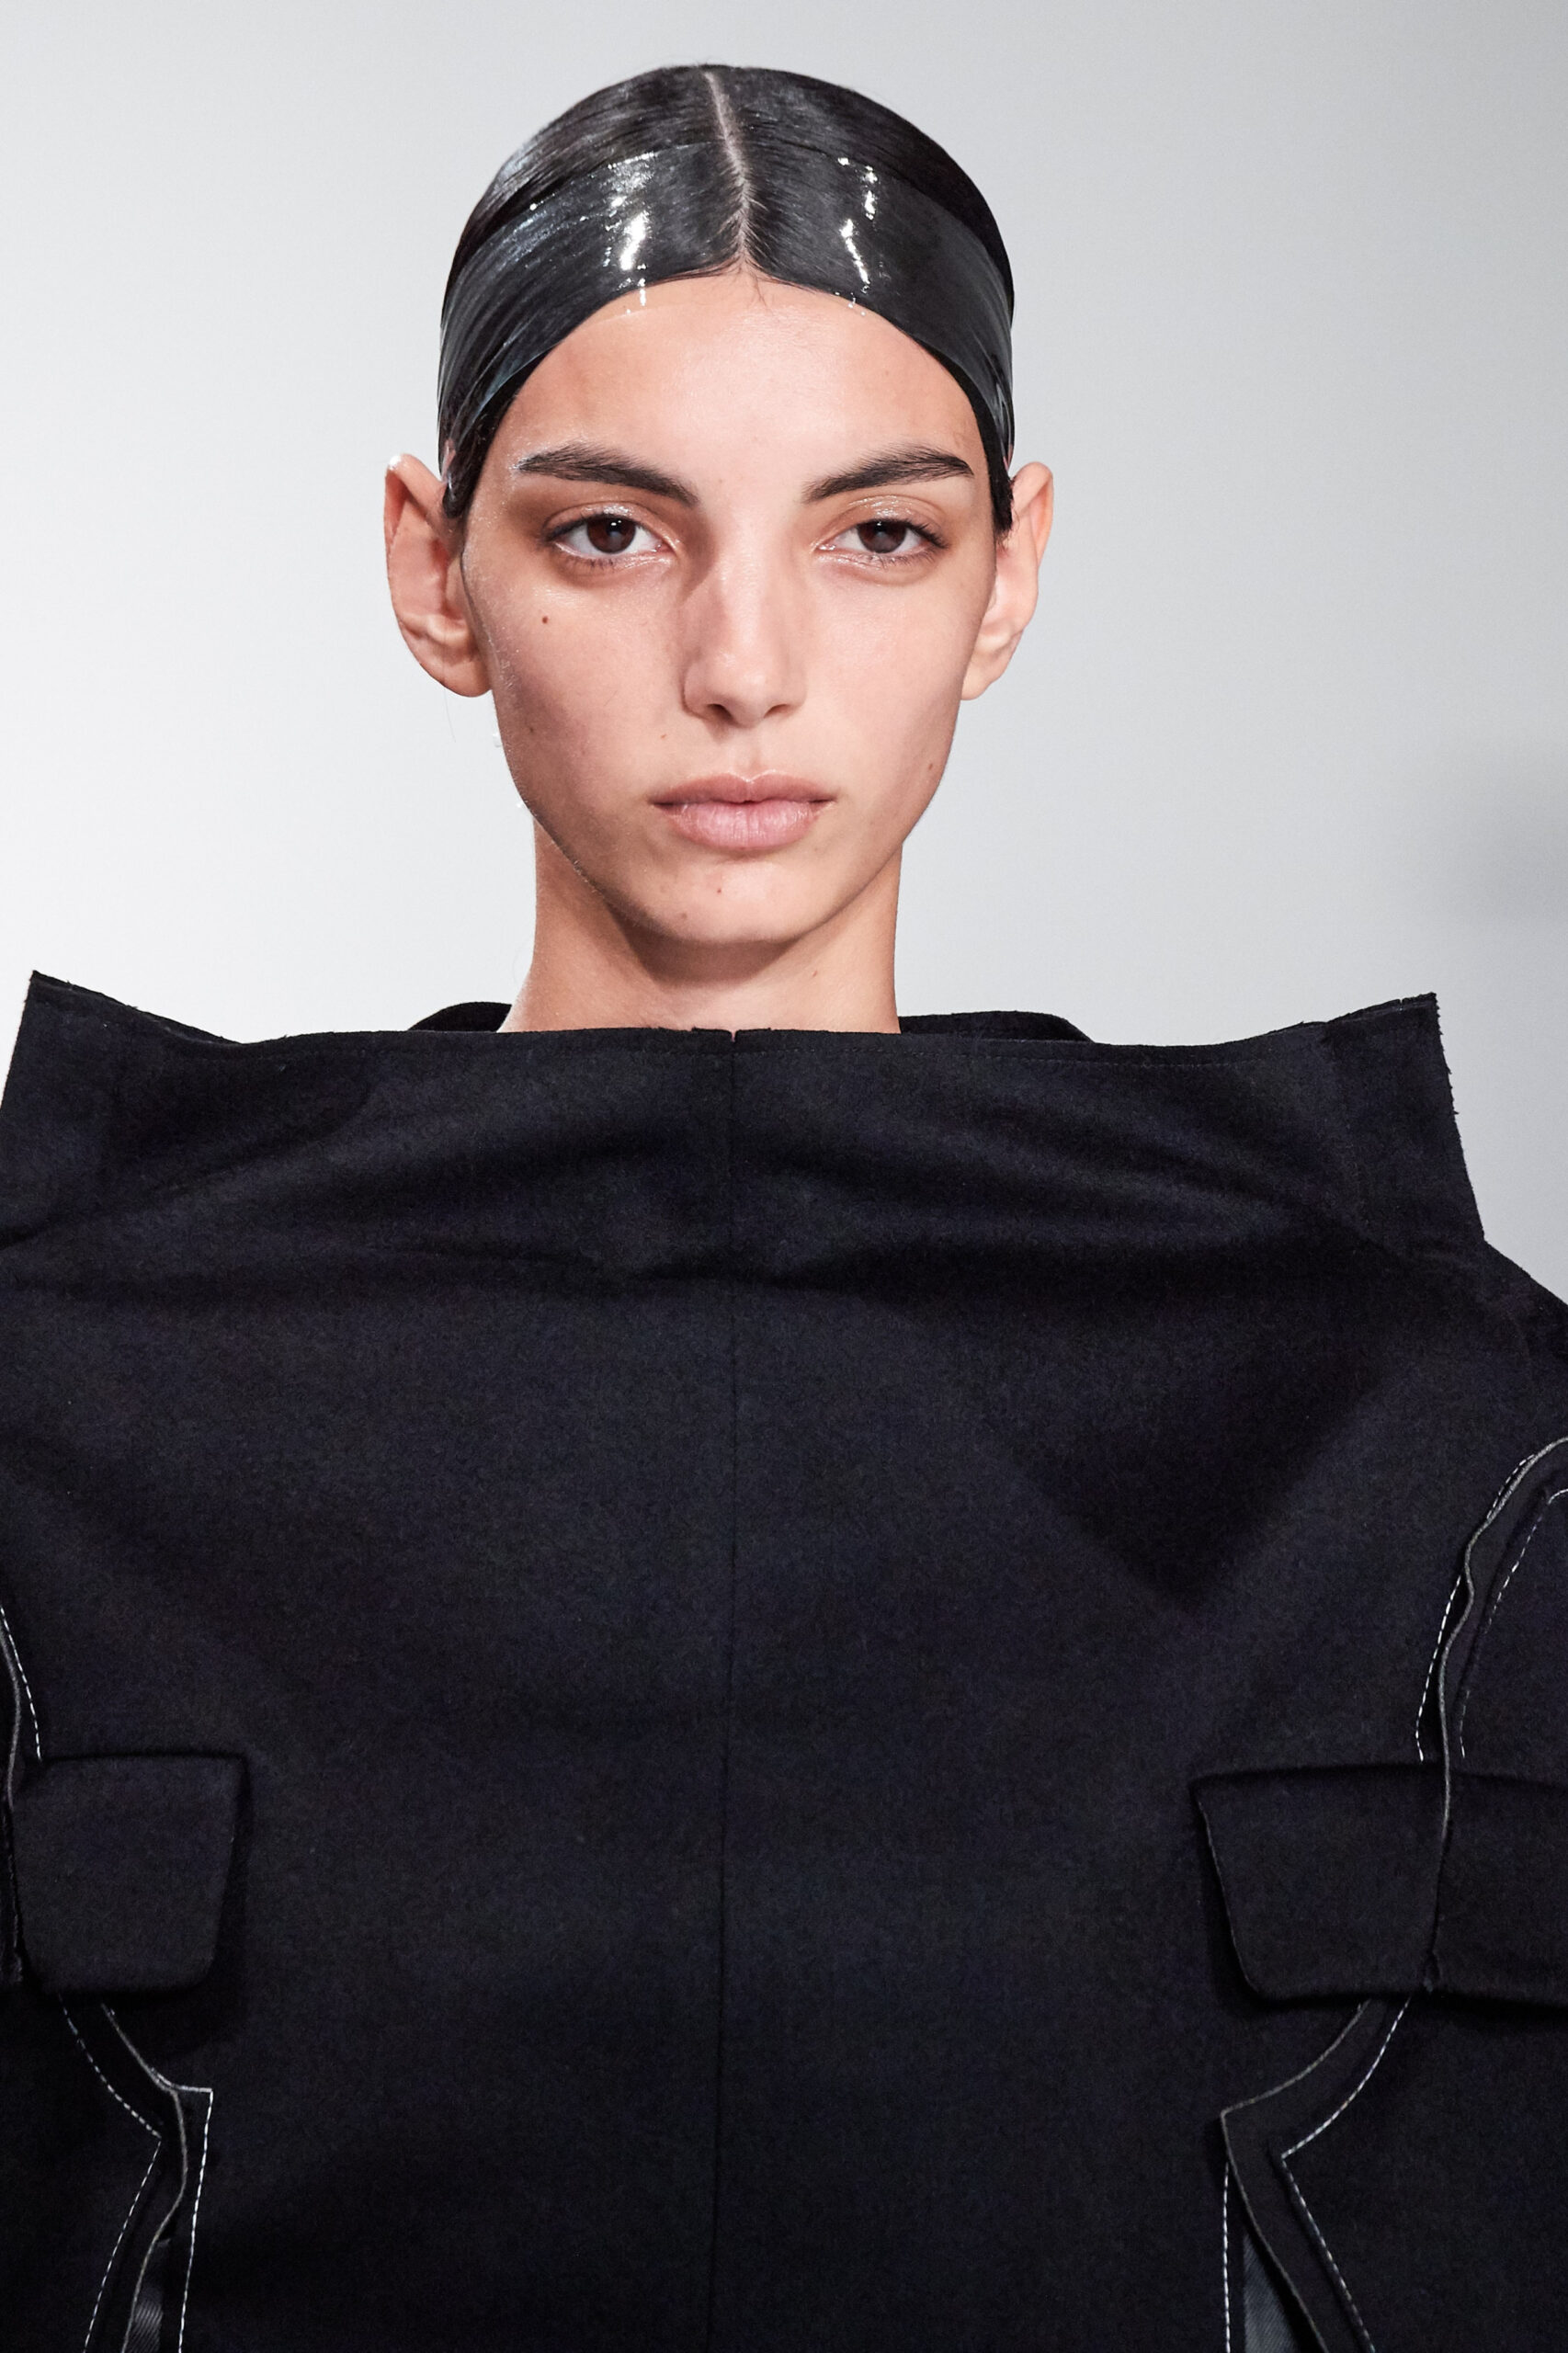 Cynthia Arrebola, la modelo argentina que pisa fuerte